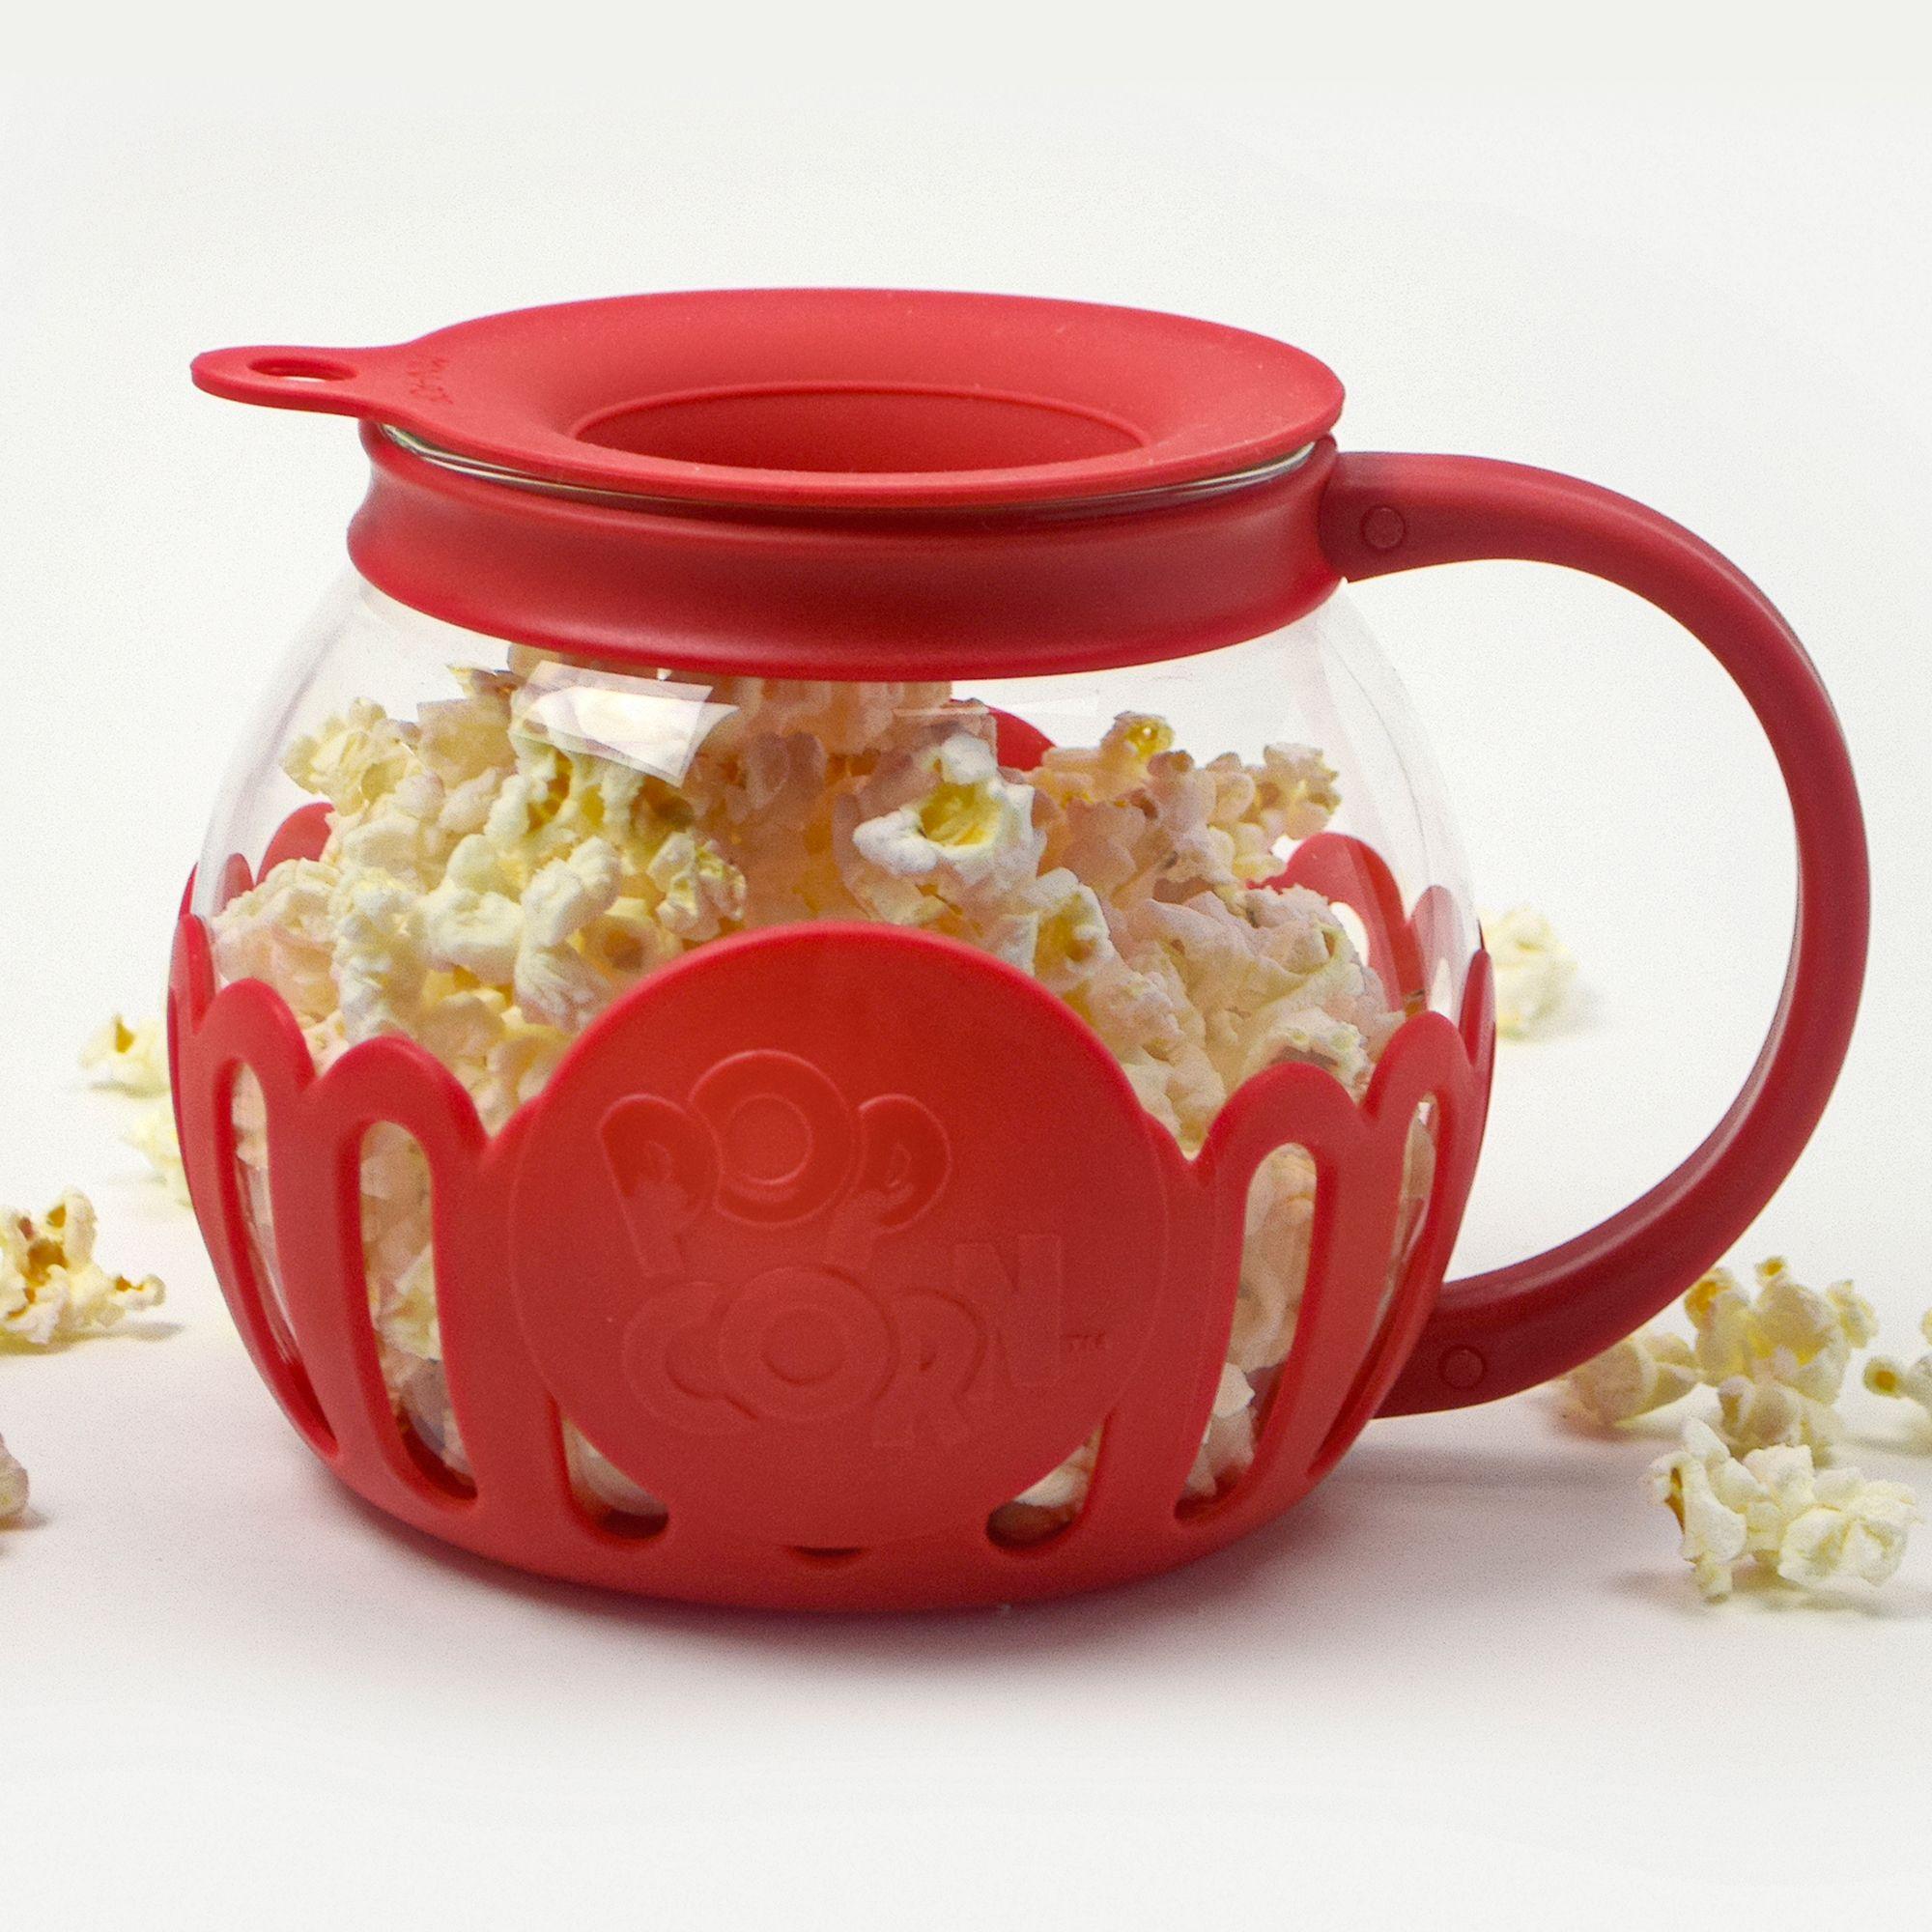 kmart com microwave popcorn popper